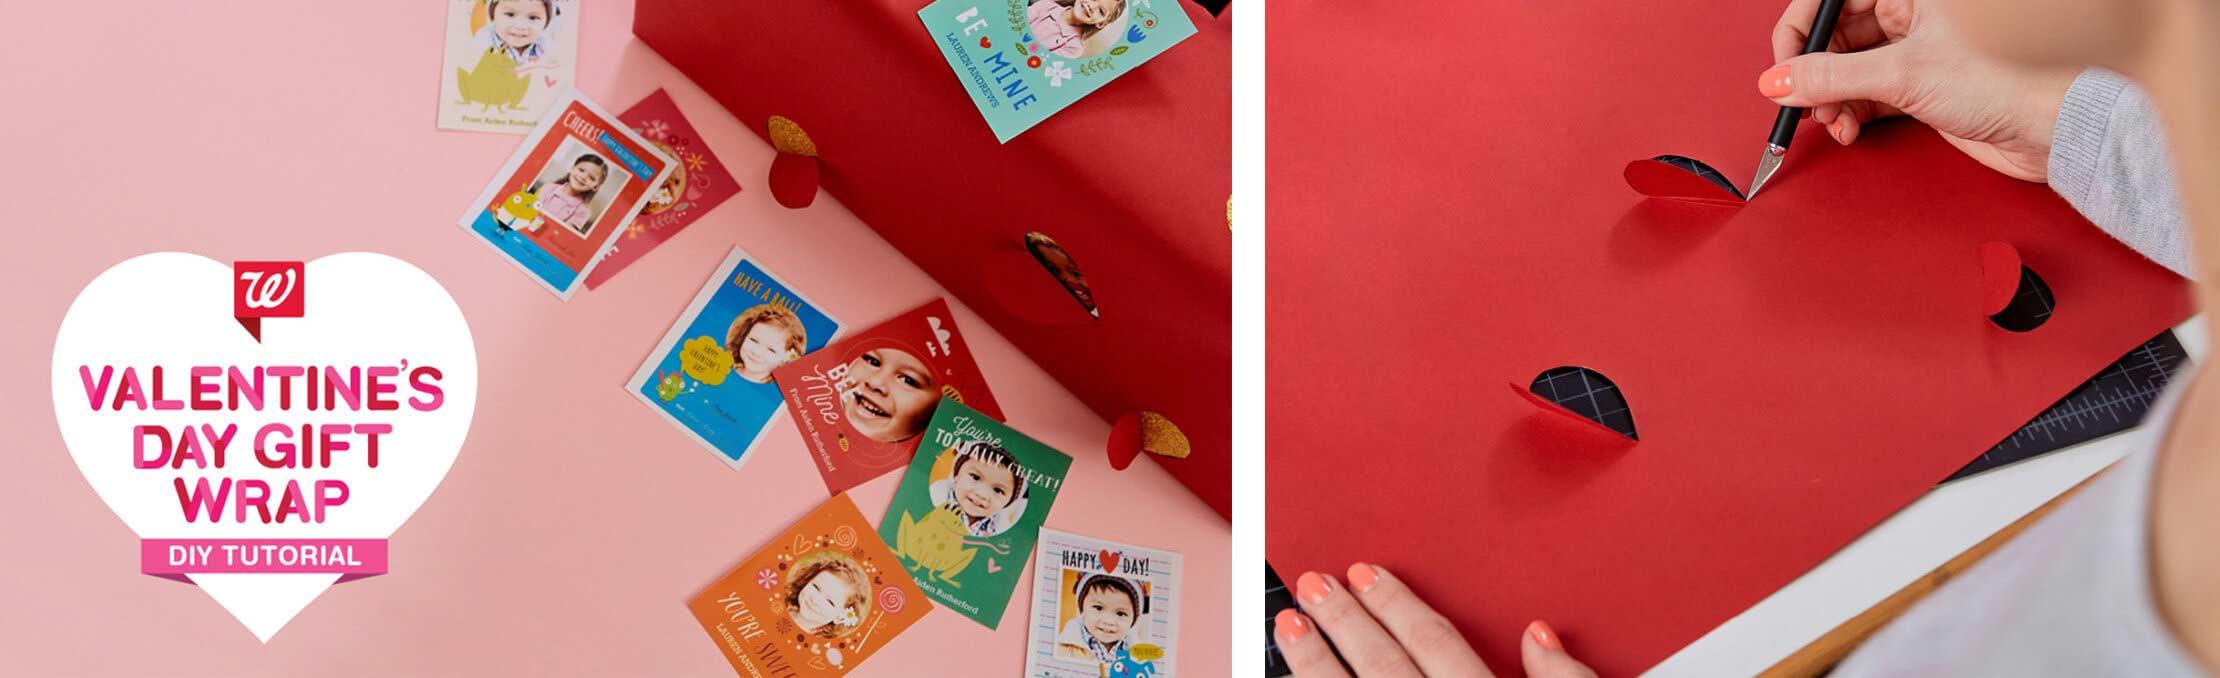 Valentine S Day Gift Wrap Idea Walgreens Photo Blog Walgreens Photo